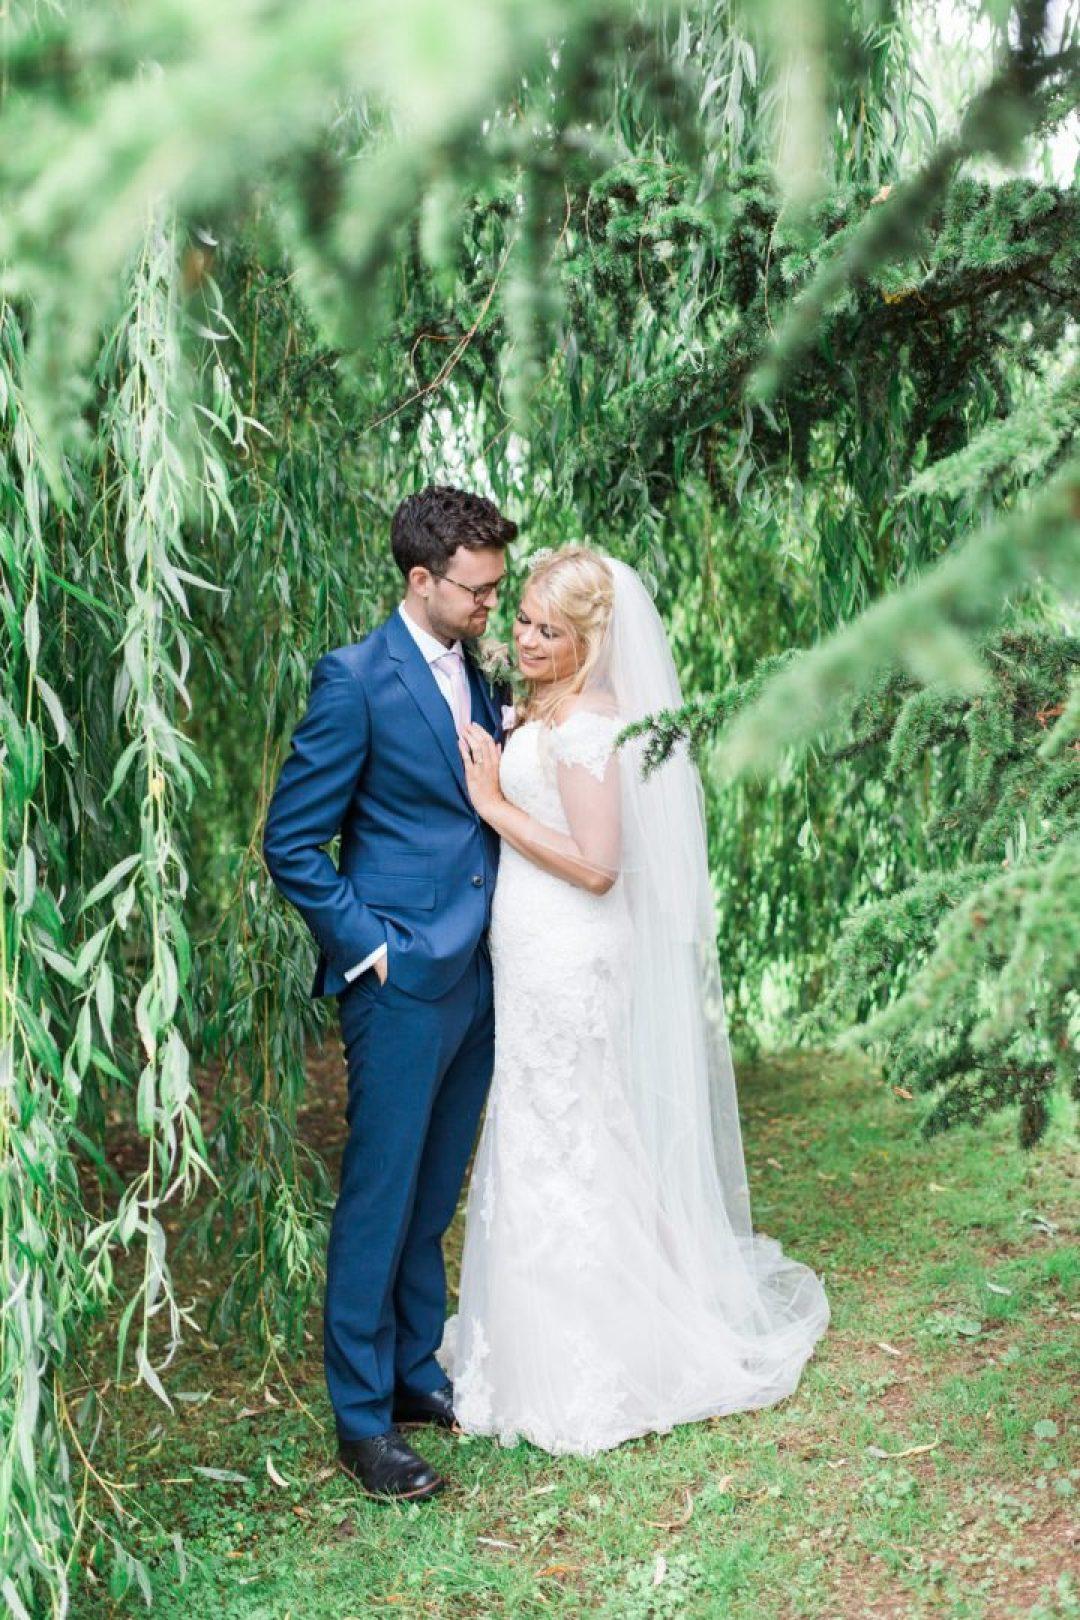 Wedding photos under a tree away from the rain